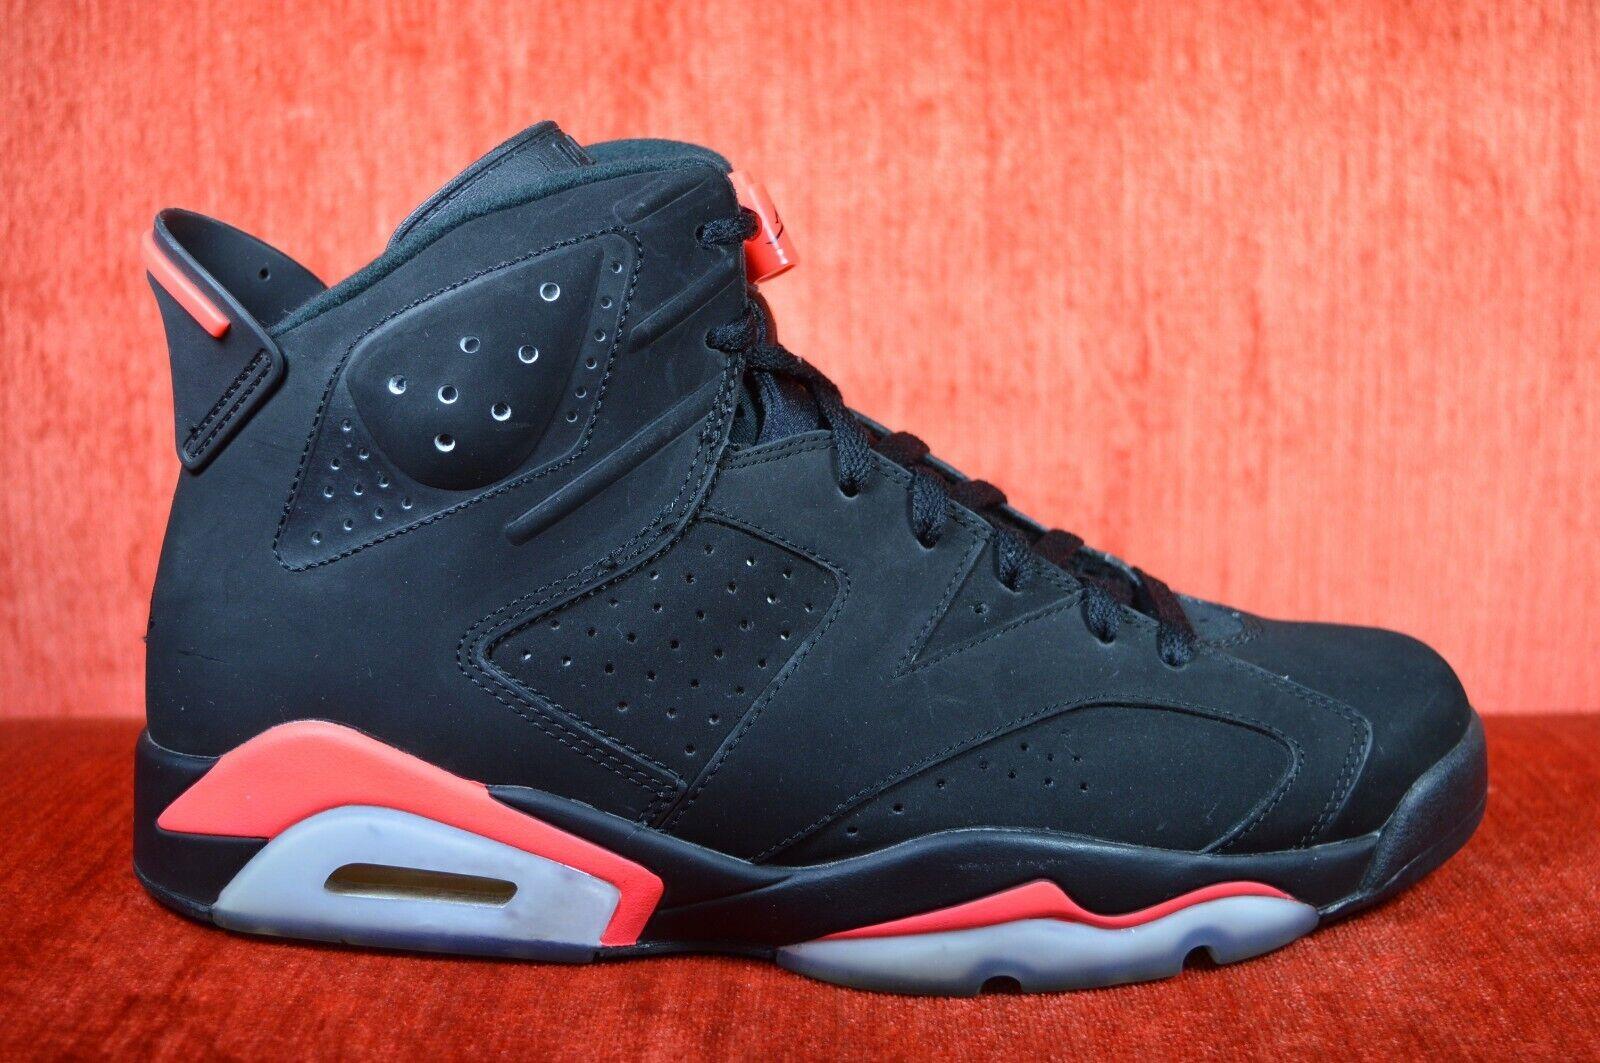 bb9c85688558b7 CLEAN Nike Air Jordan 6 Retro Black Infrared Infrared Infrared 2014 384664-023  Size 10.5